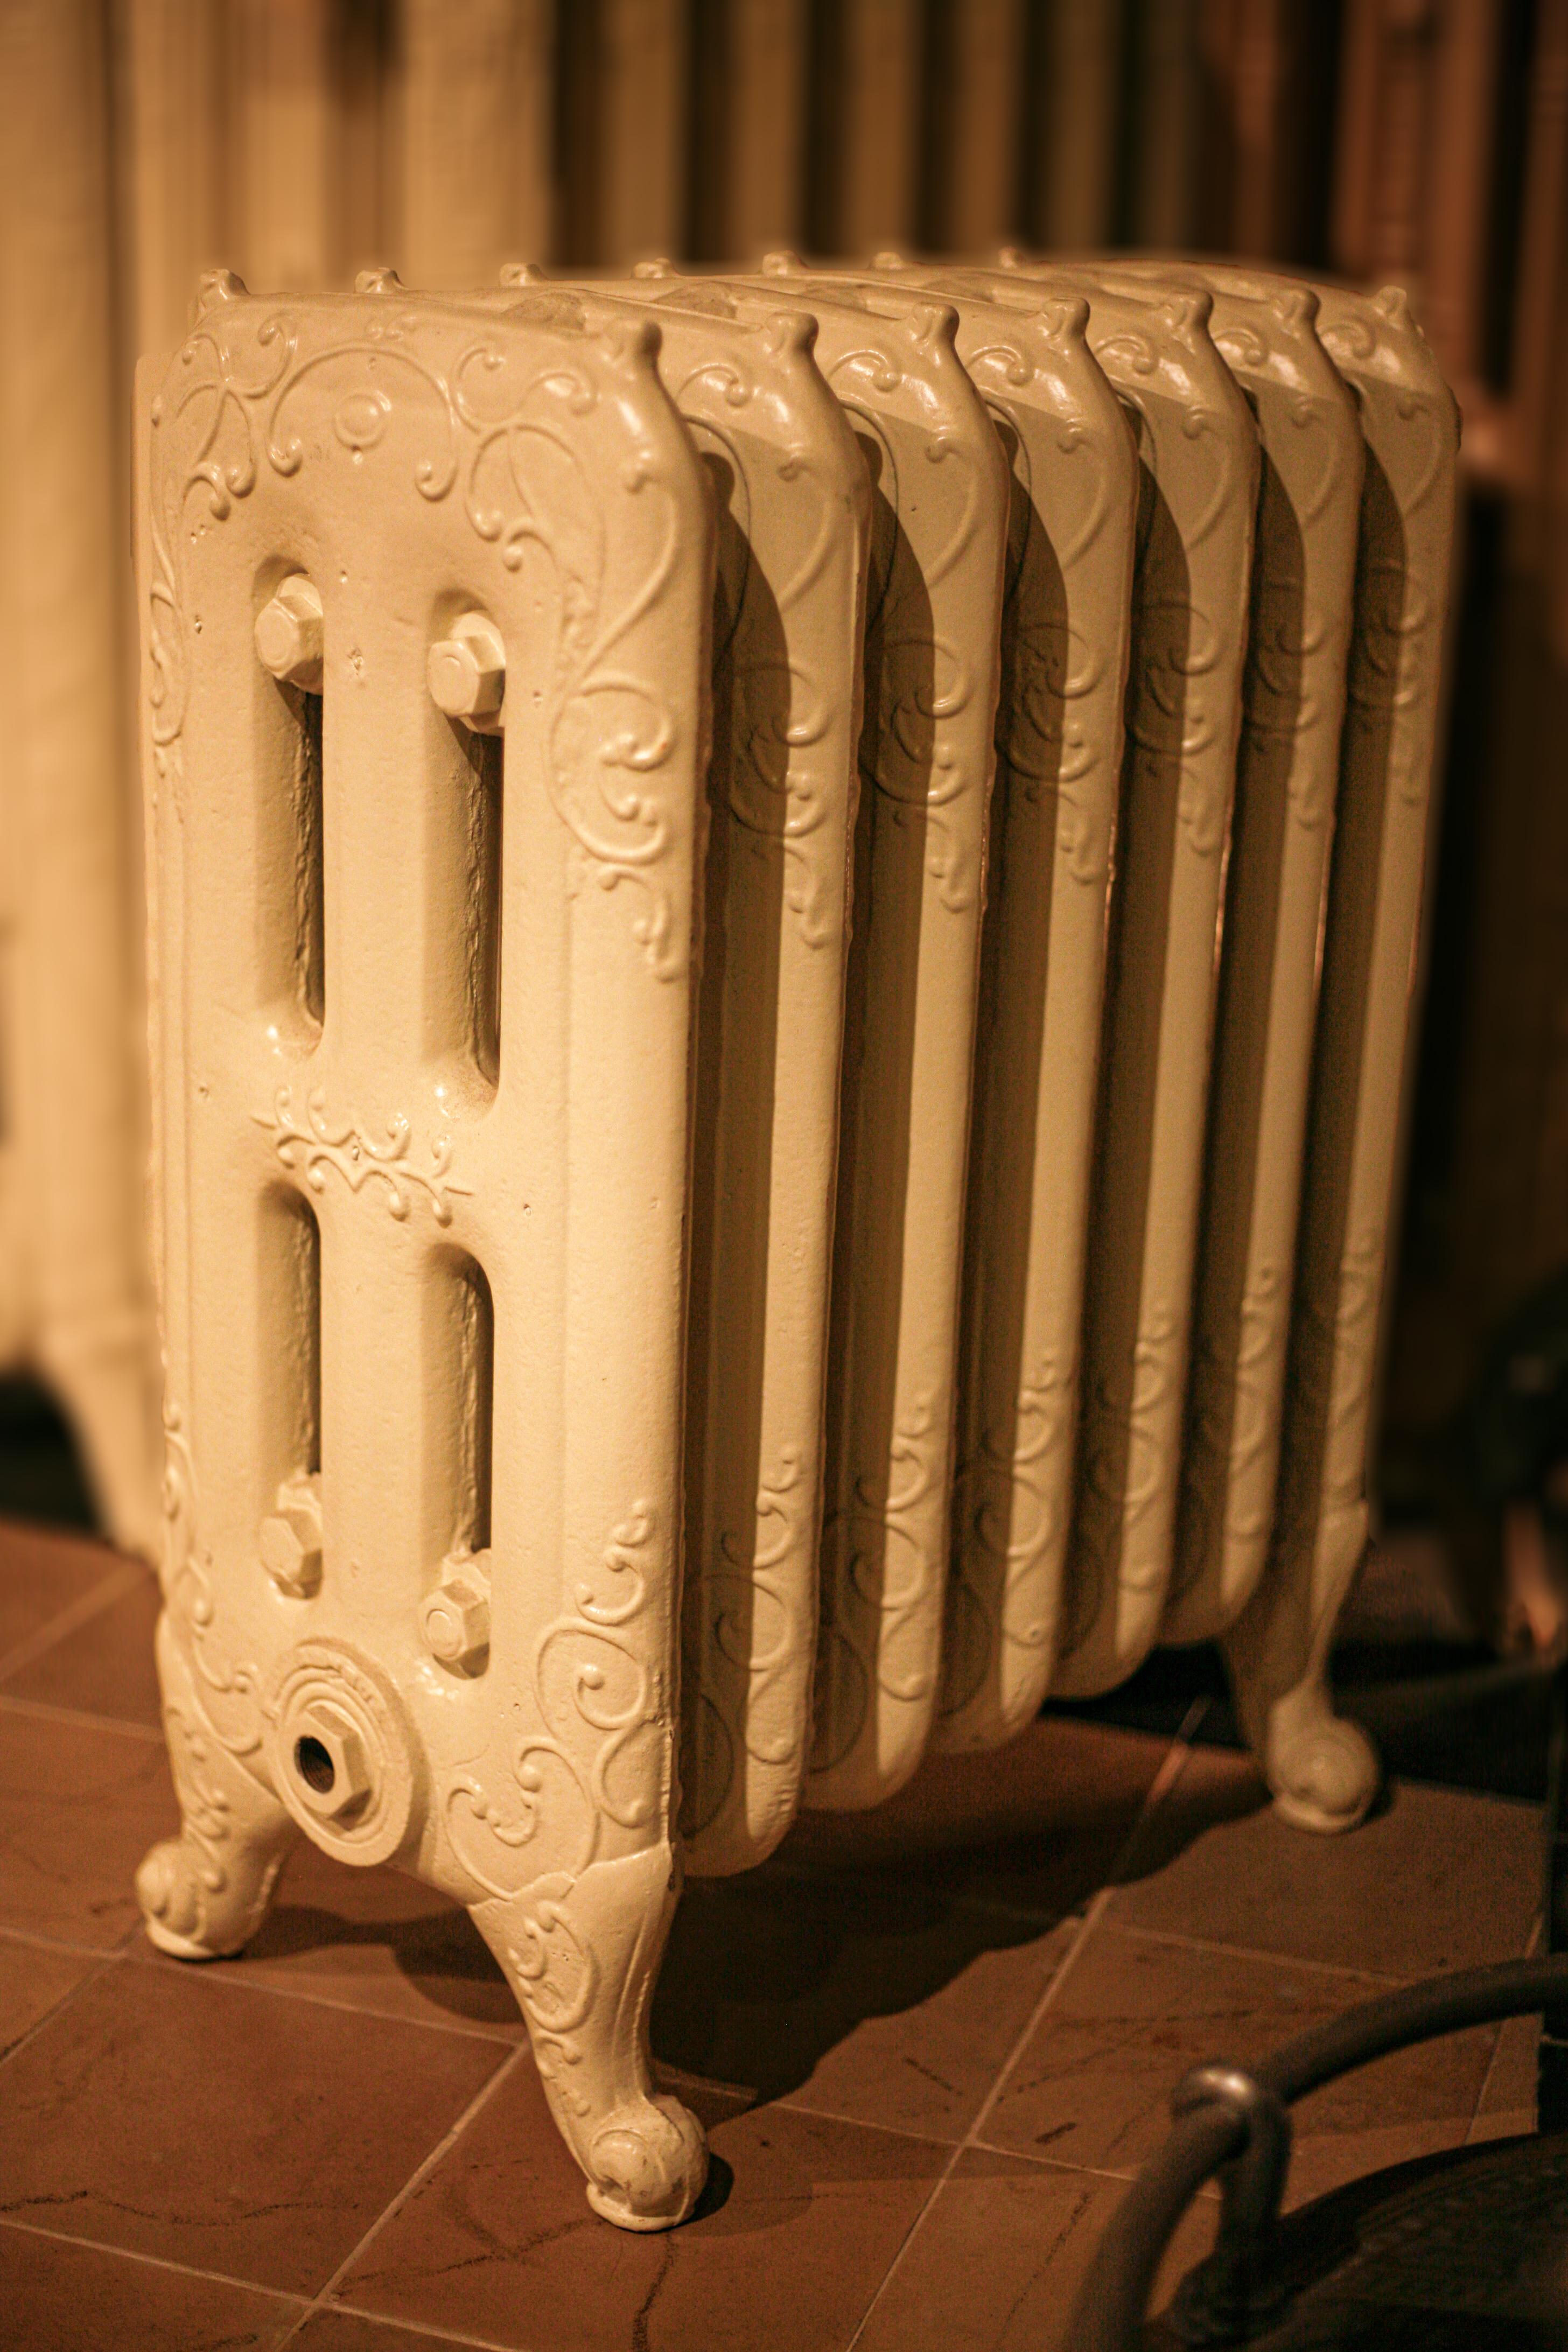 Lage unieke gietijzeren radiator